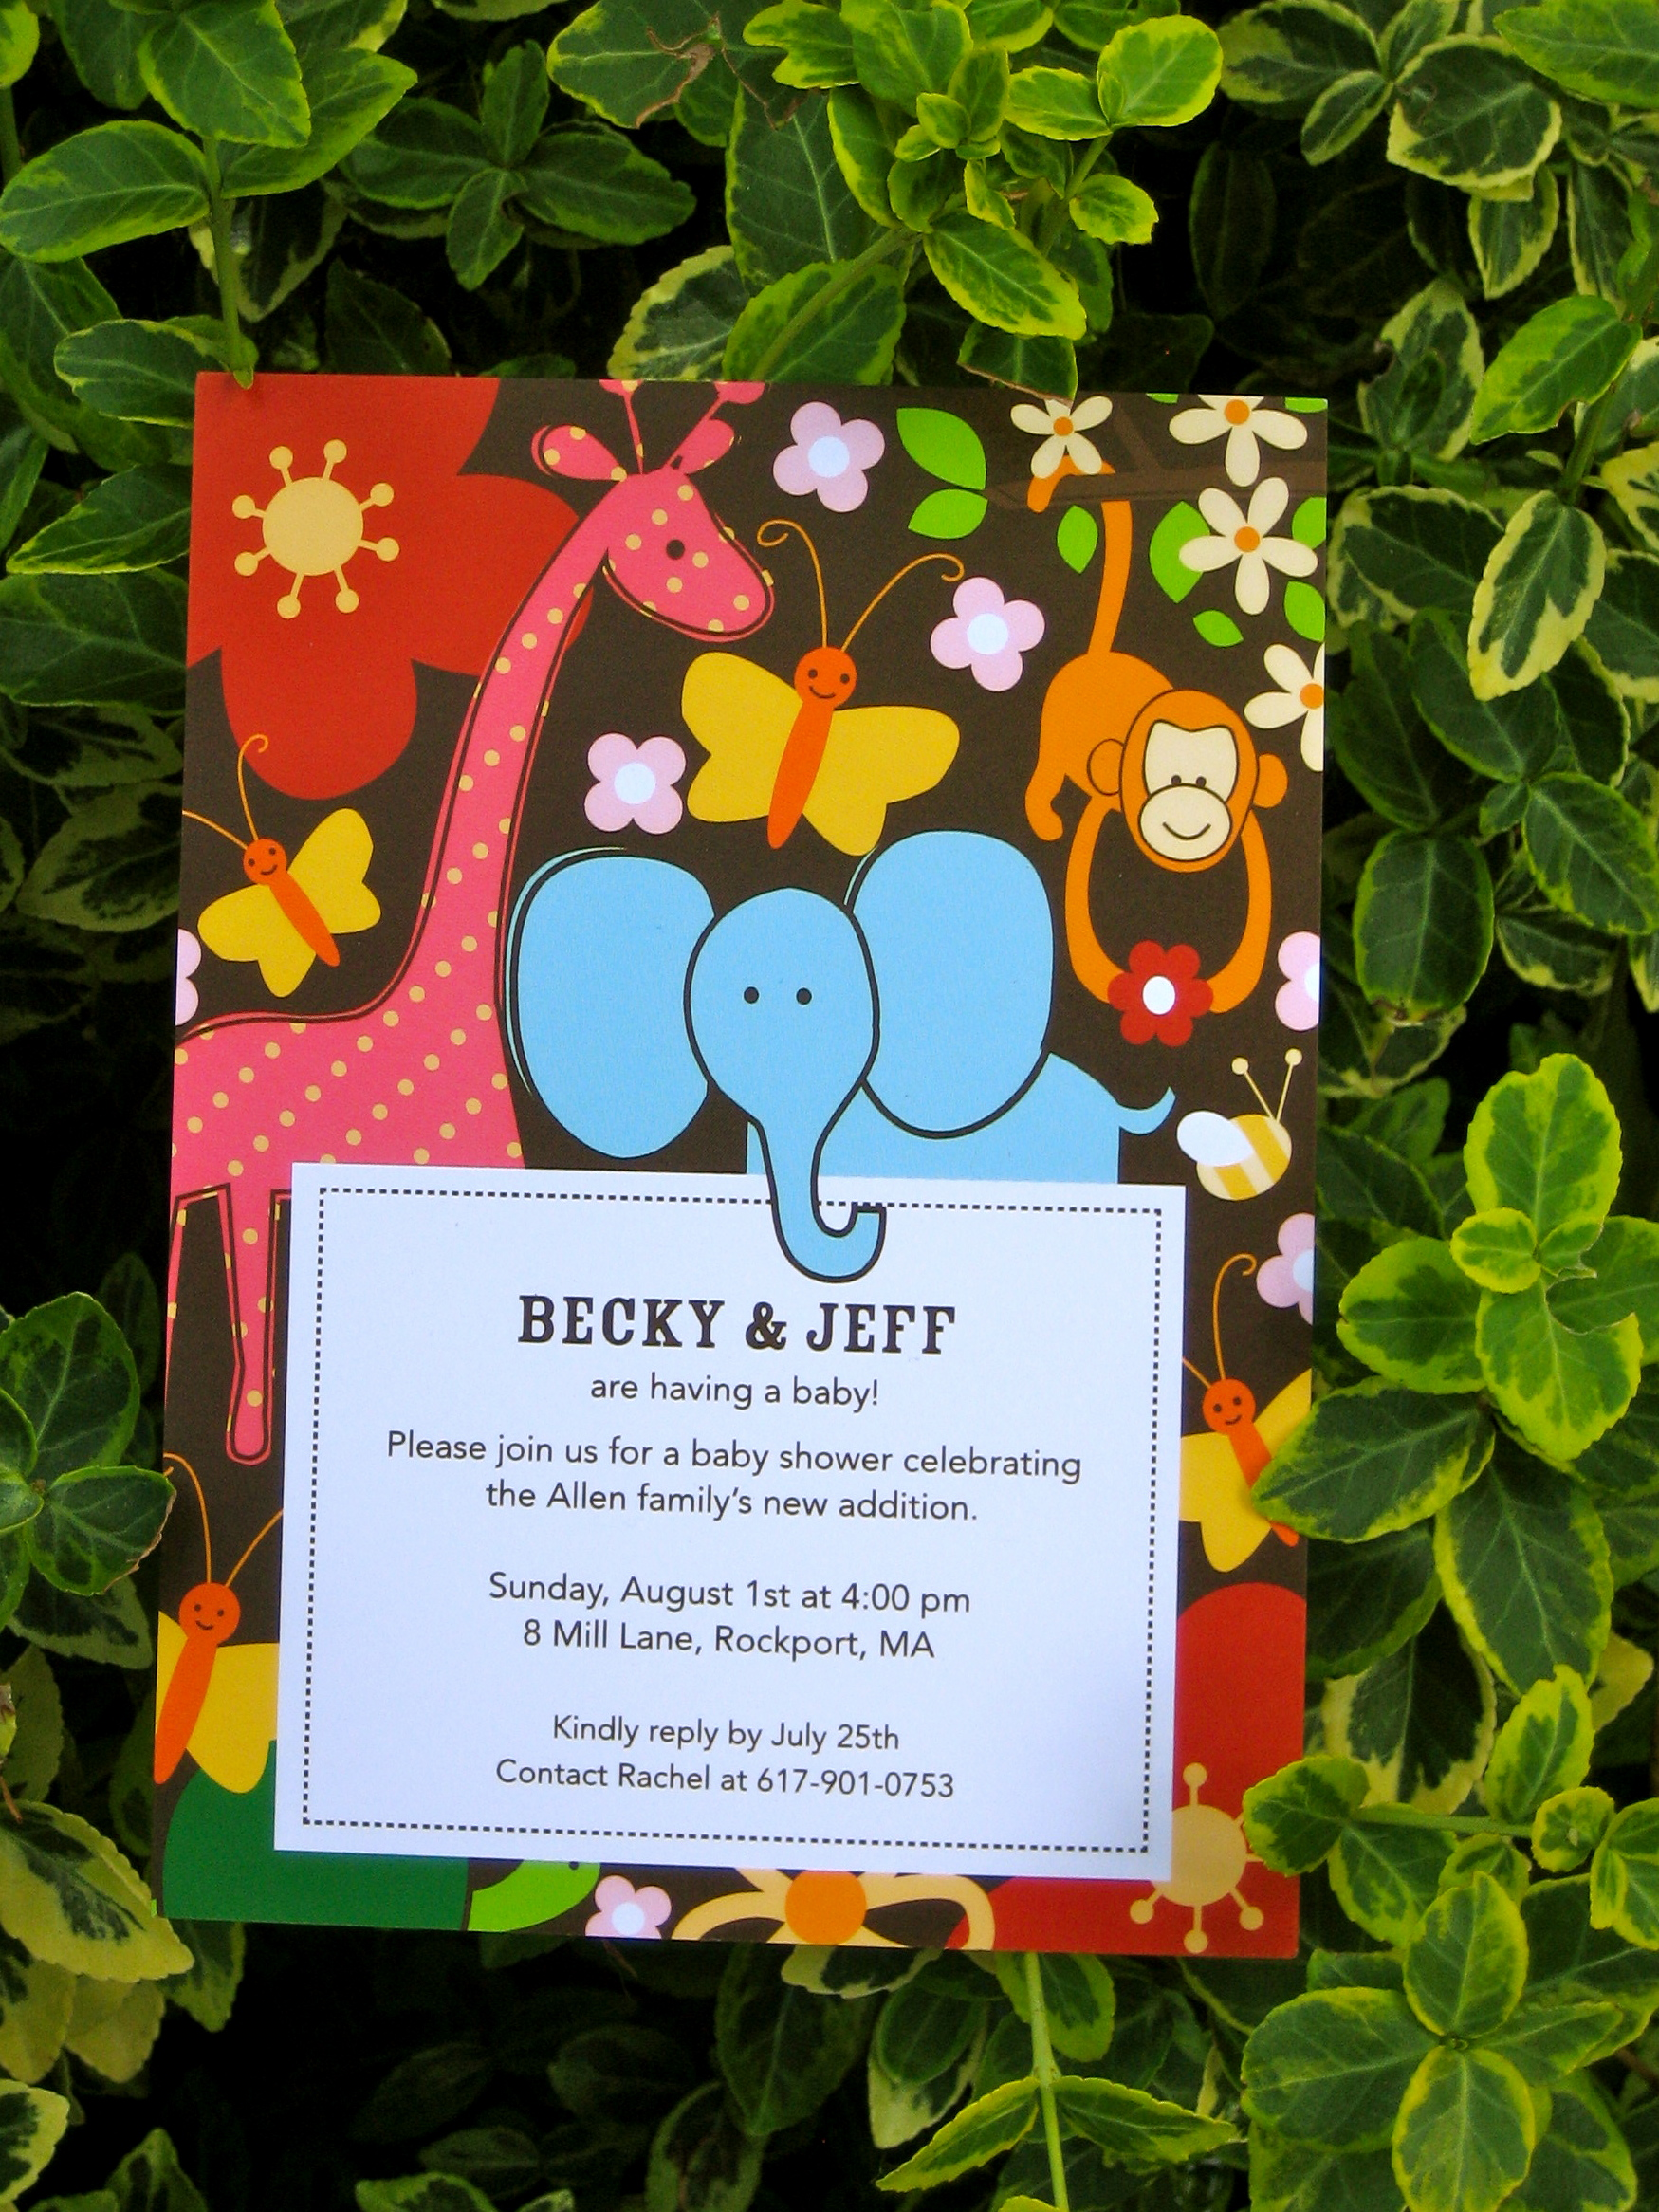 Monkeys Elephants Giraffes = Absolute Adorable Baby Shower